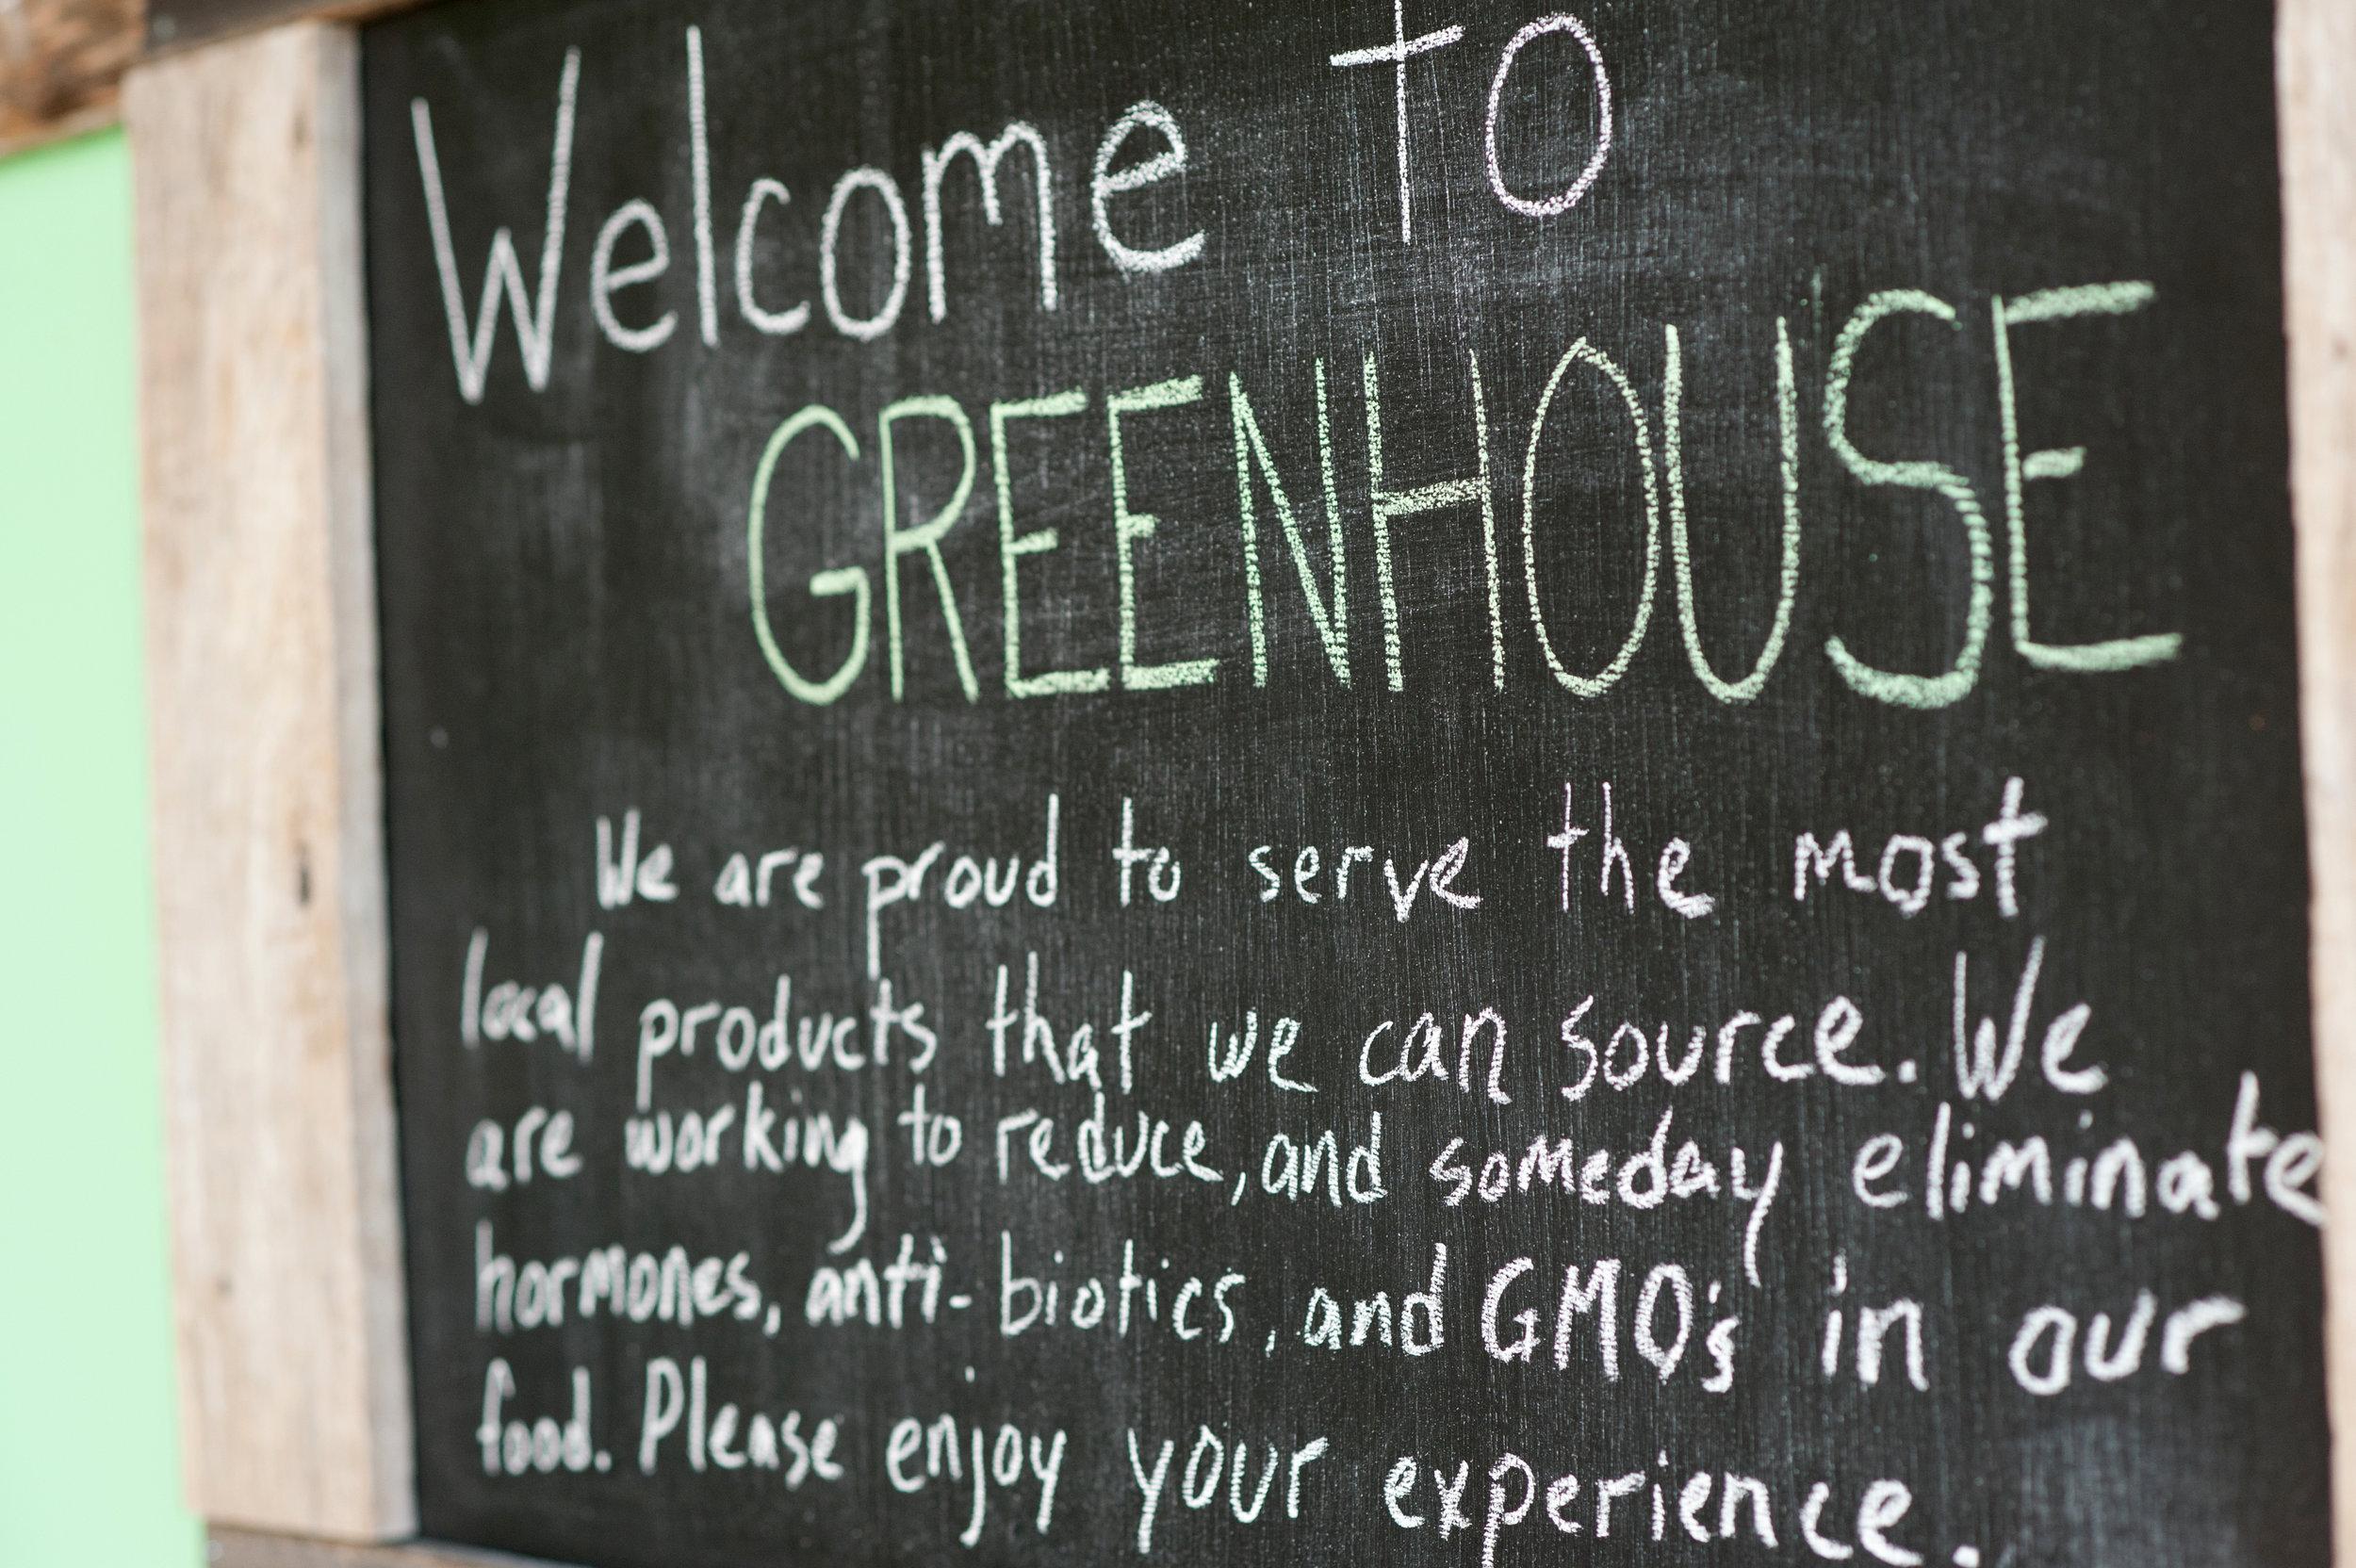 Greenhouse-214.jpg